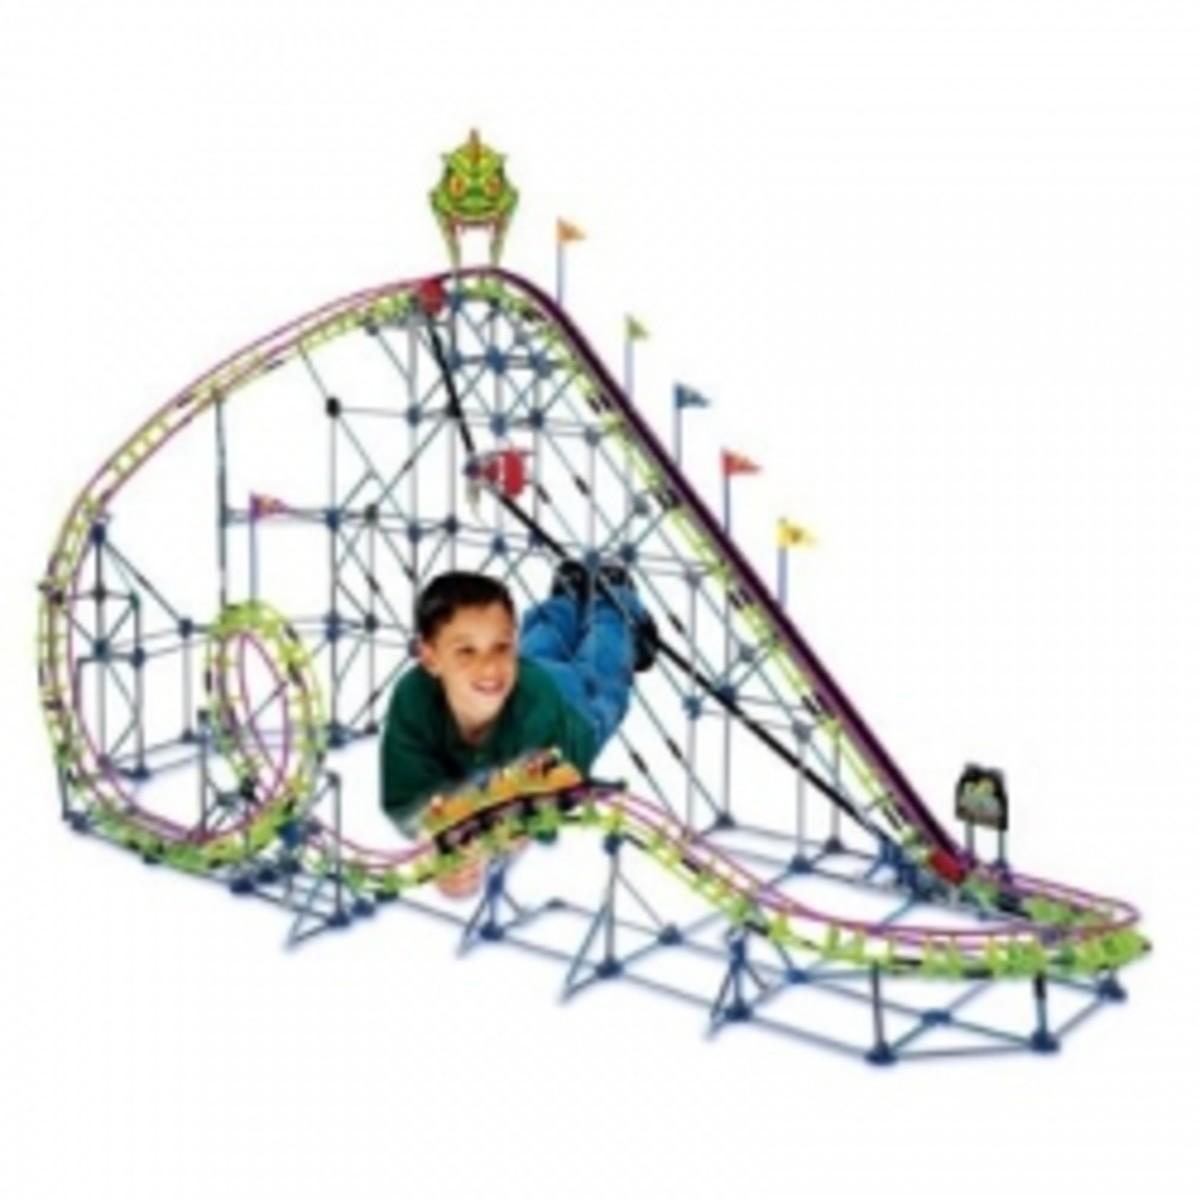 K'nex Roller Coasters - 14 Models Featured